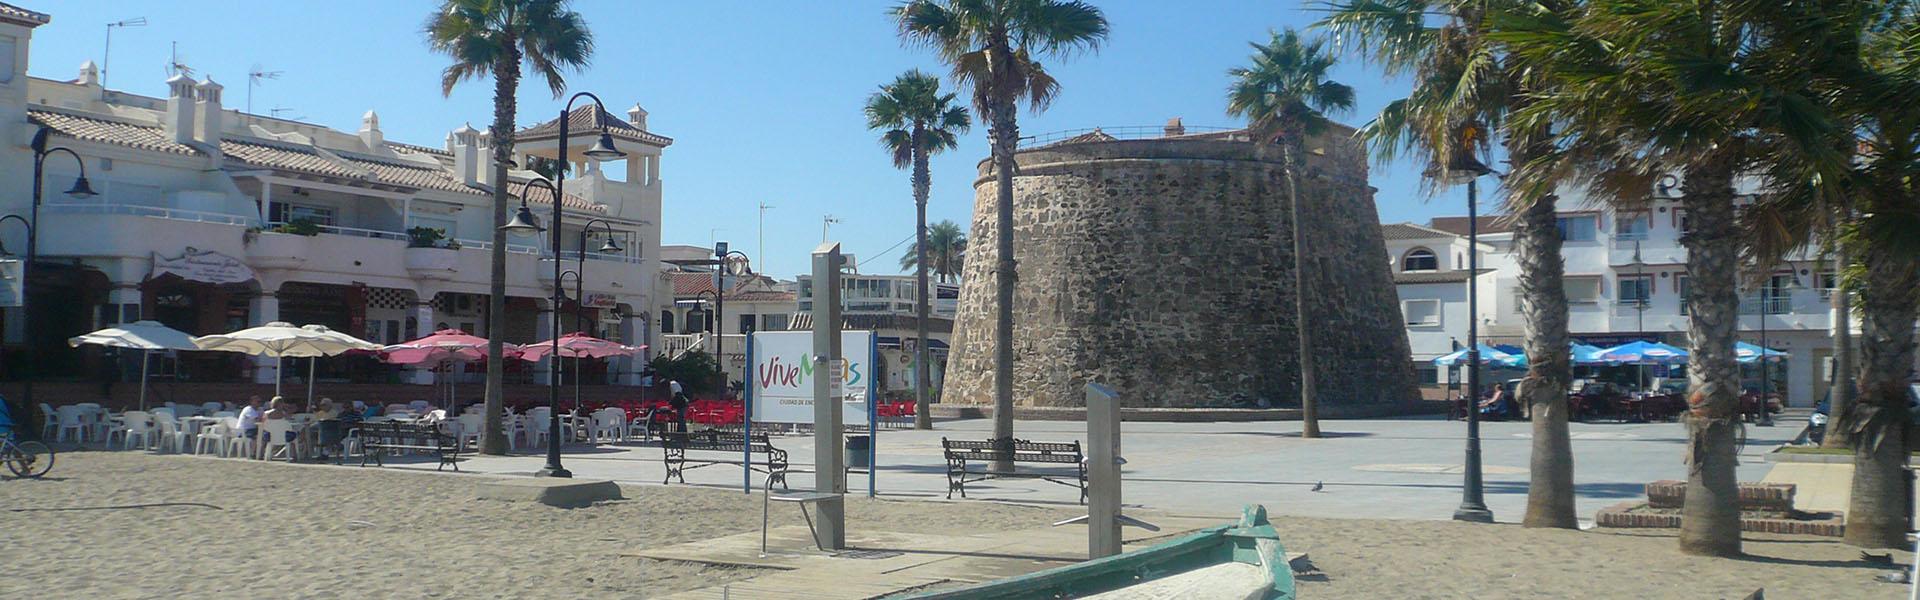 Mijas. La Cala Beach